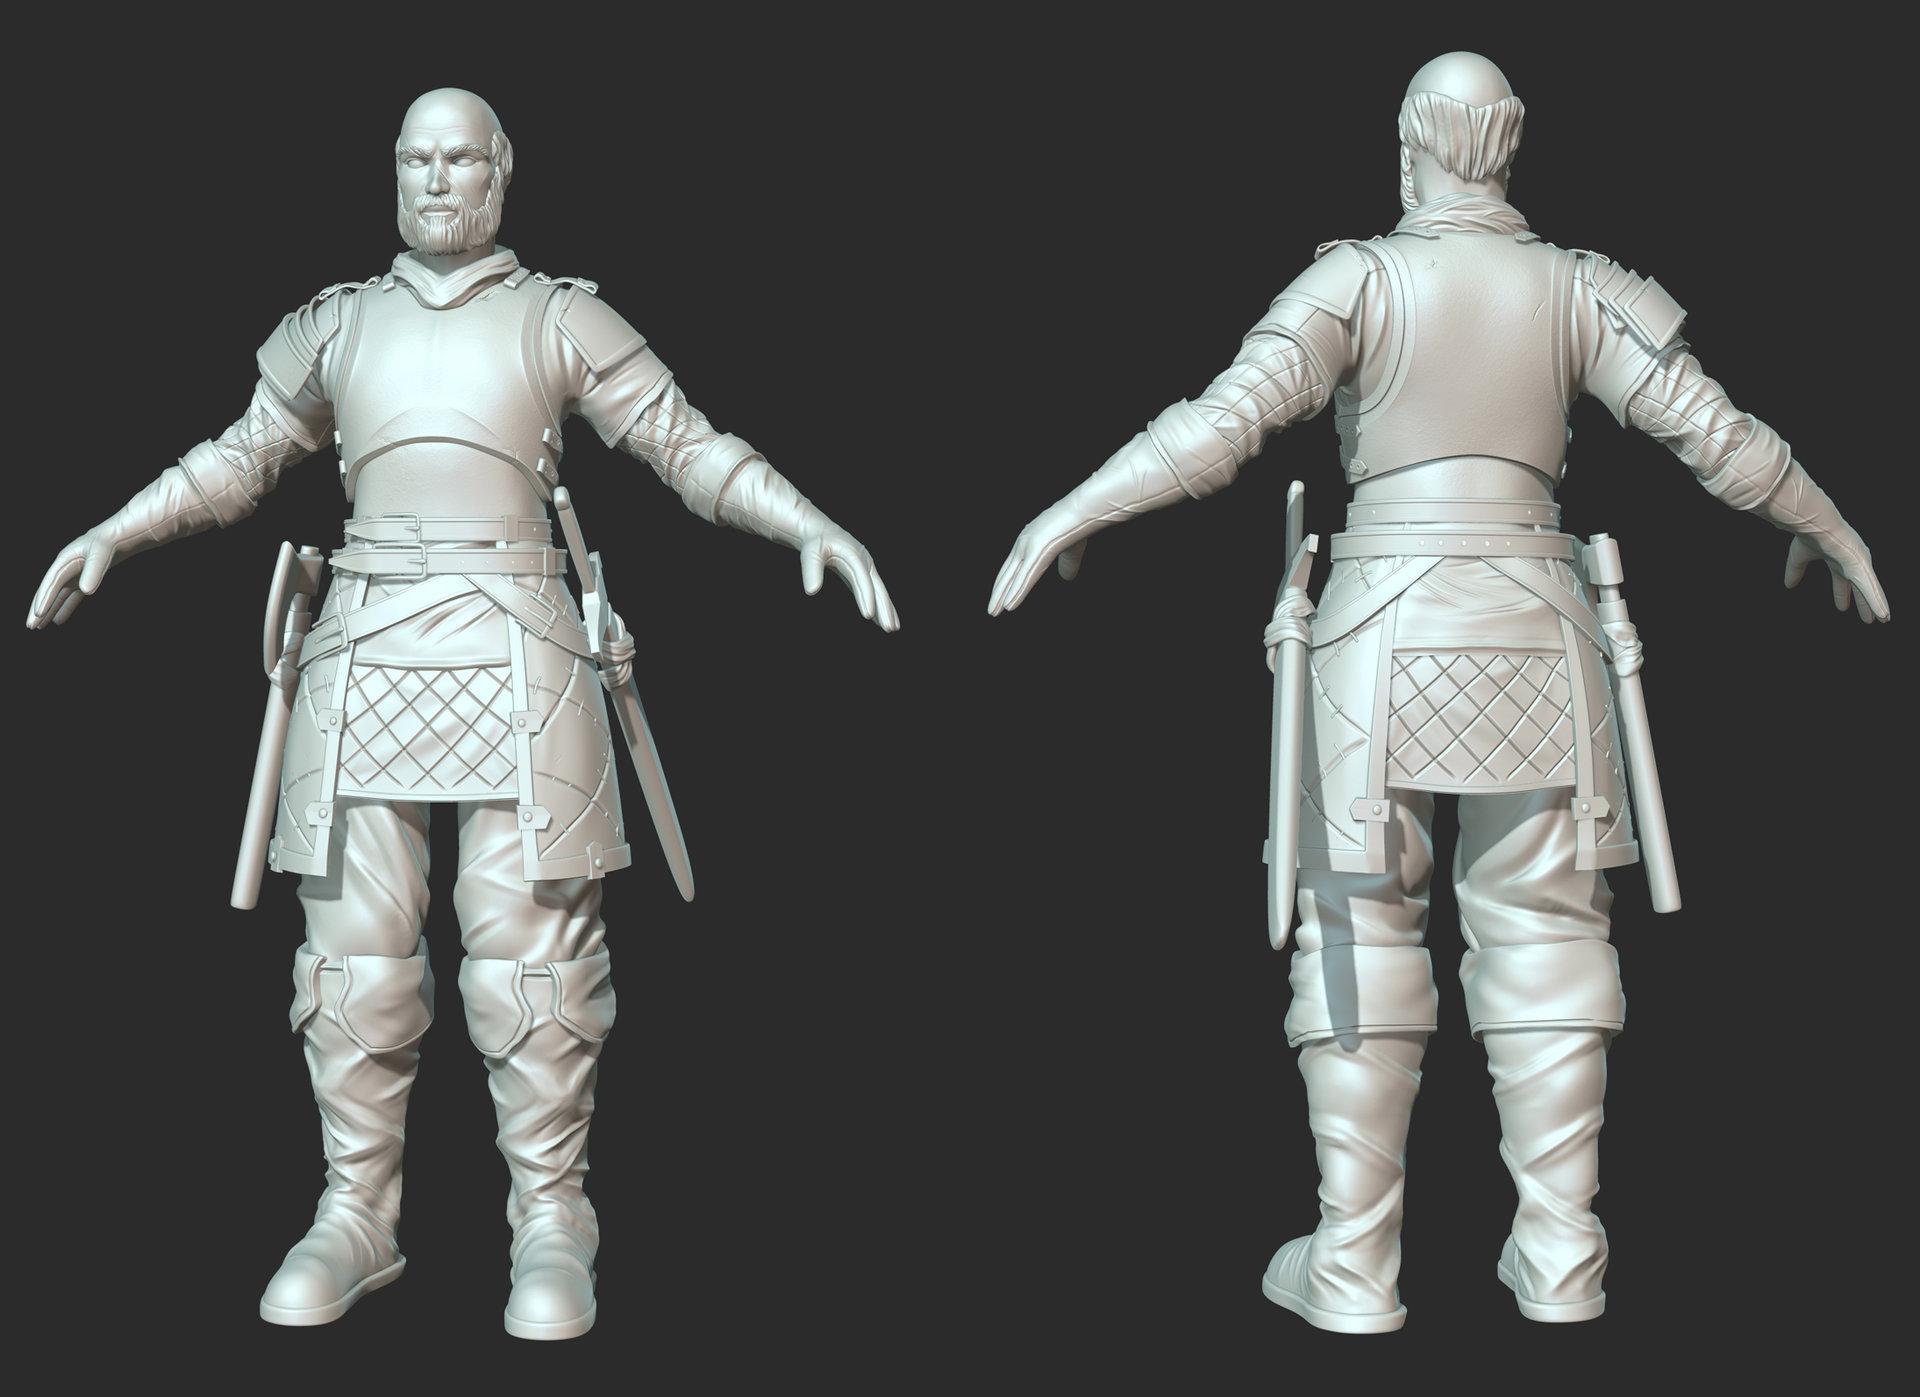 the Medieval Dude - Sculpt